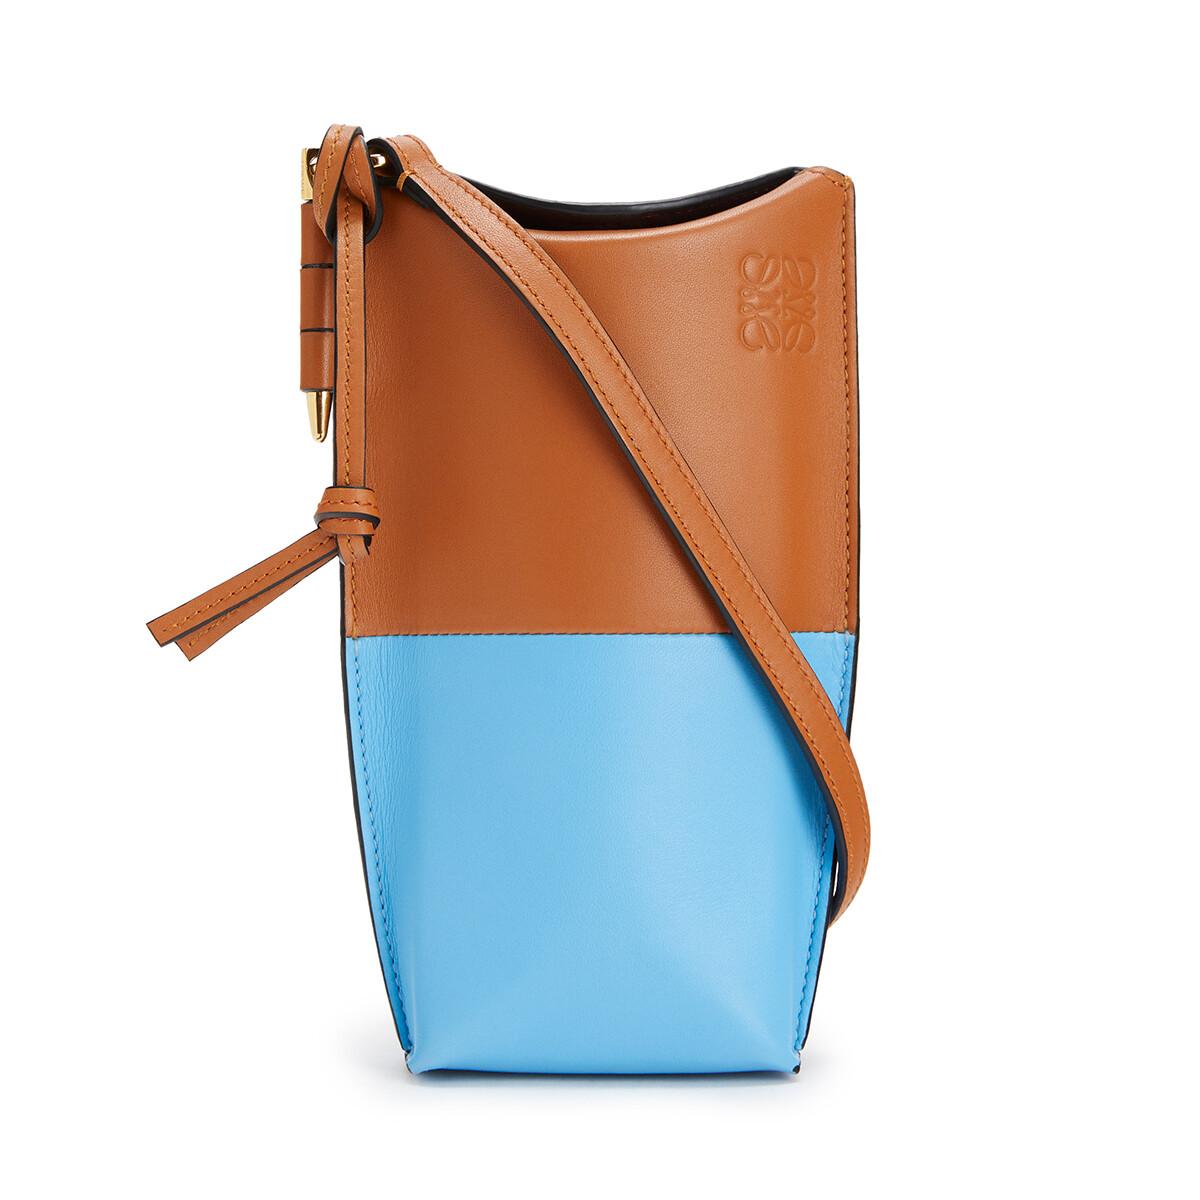 LOEWE Gate Pocket Tan/Sky Blue front